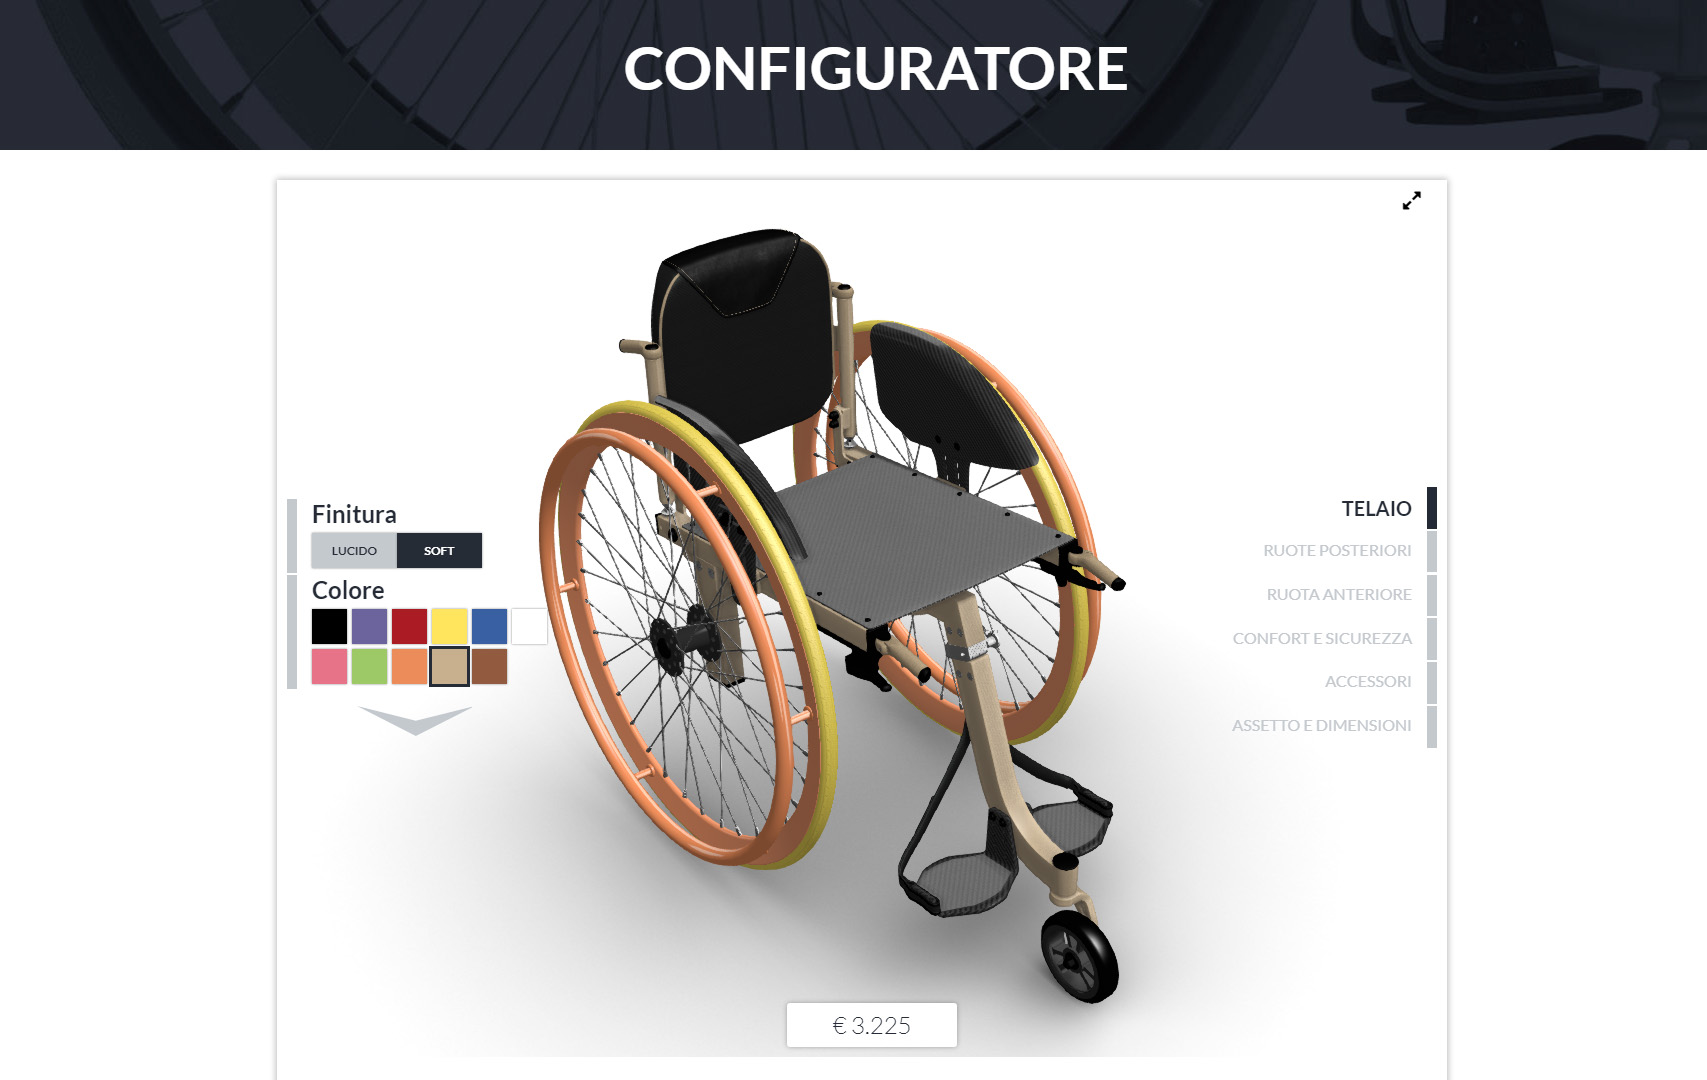 Configuratore 3D Blender Conference